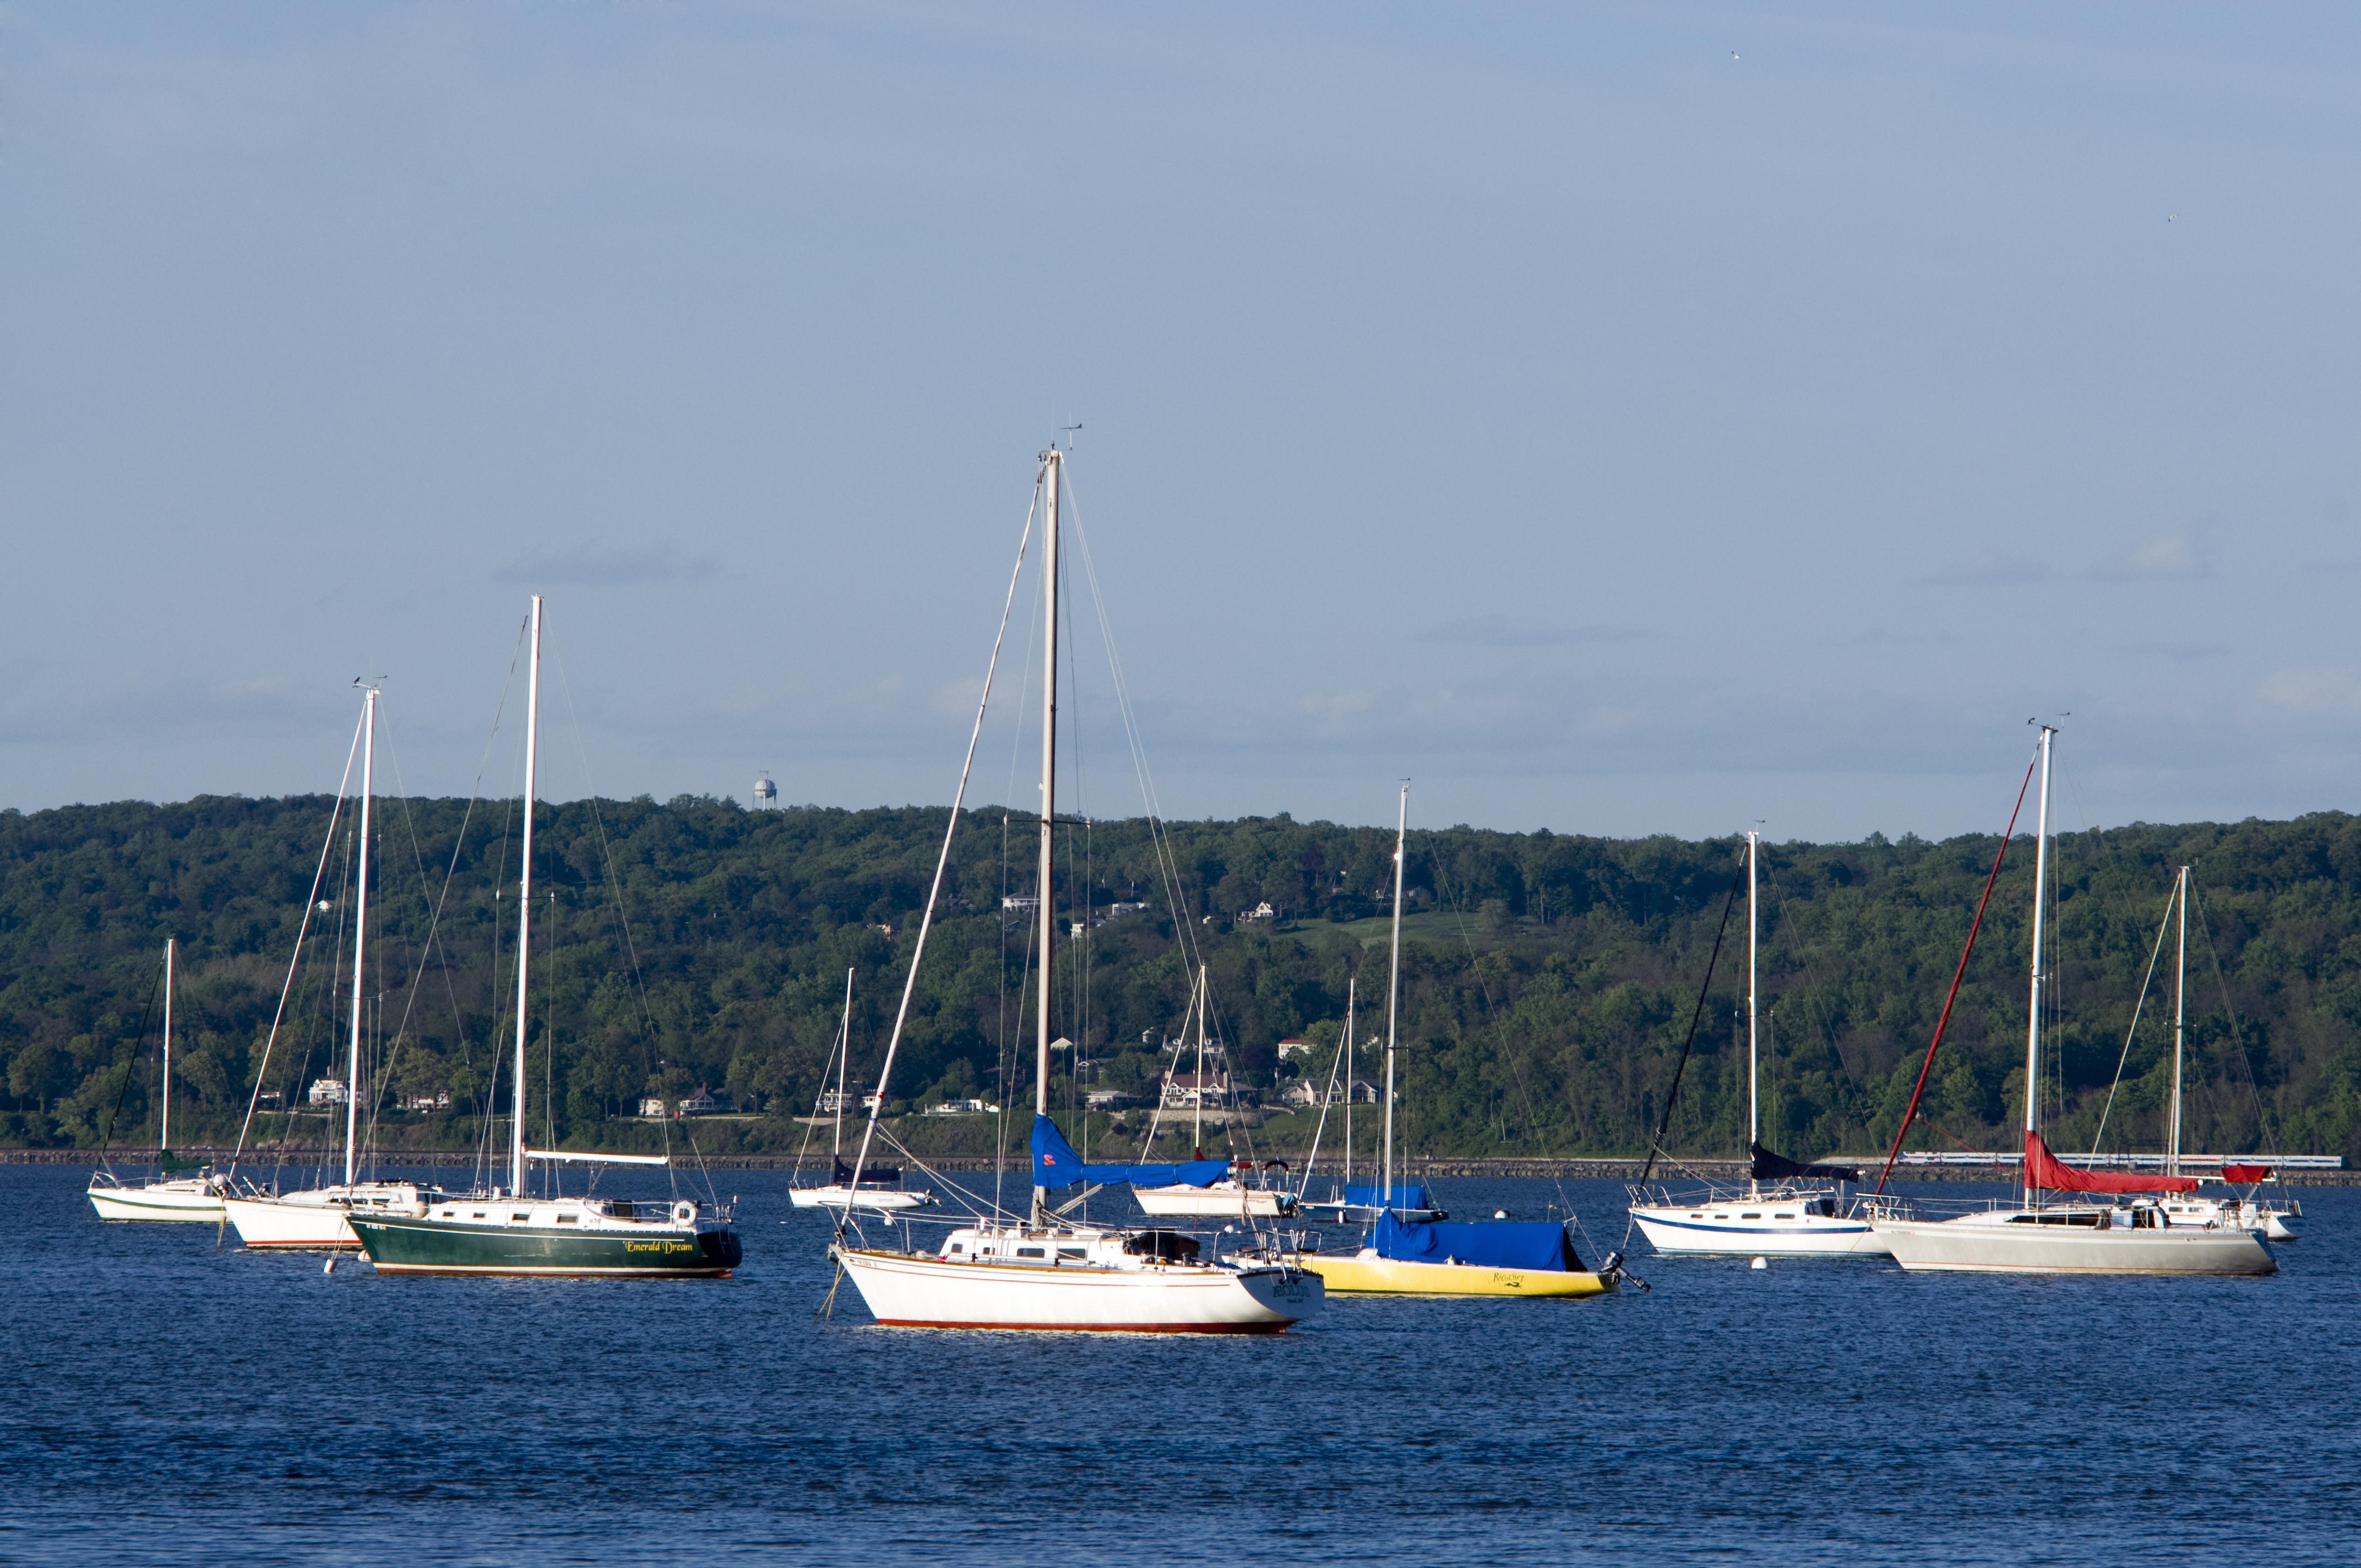 Boats on the Hudson, Blue, Boats, Daylight, Docked, HQ Photo